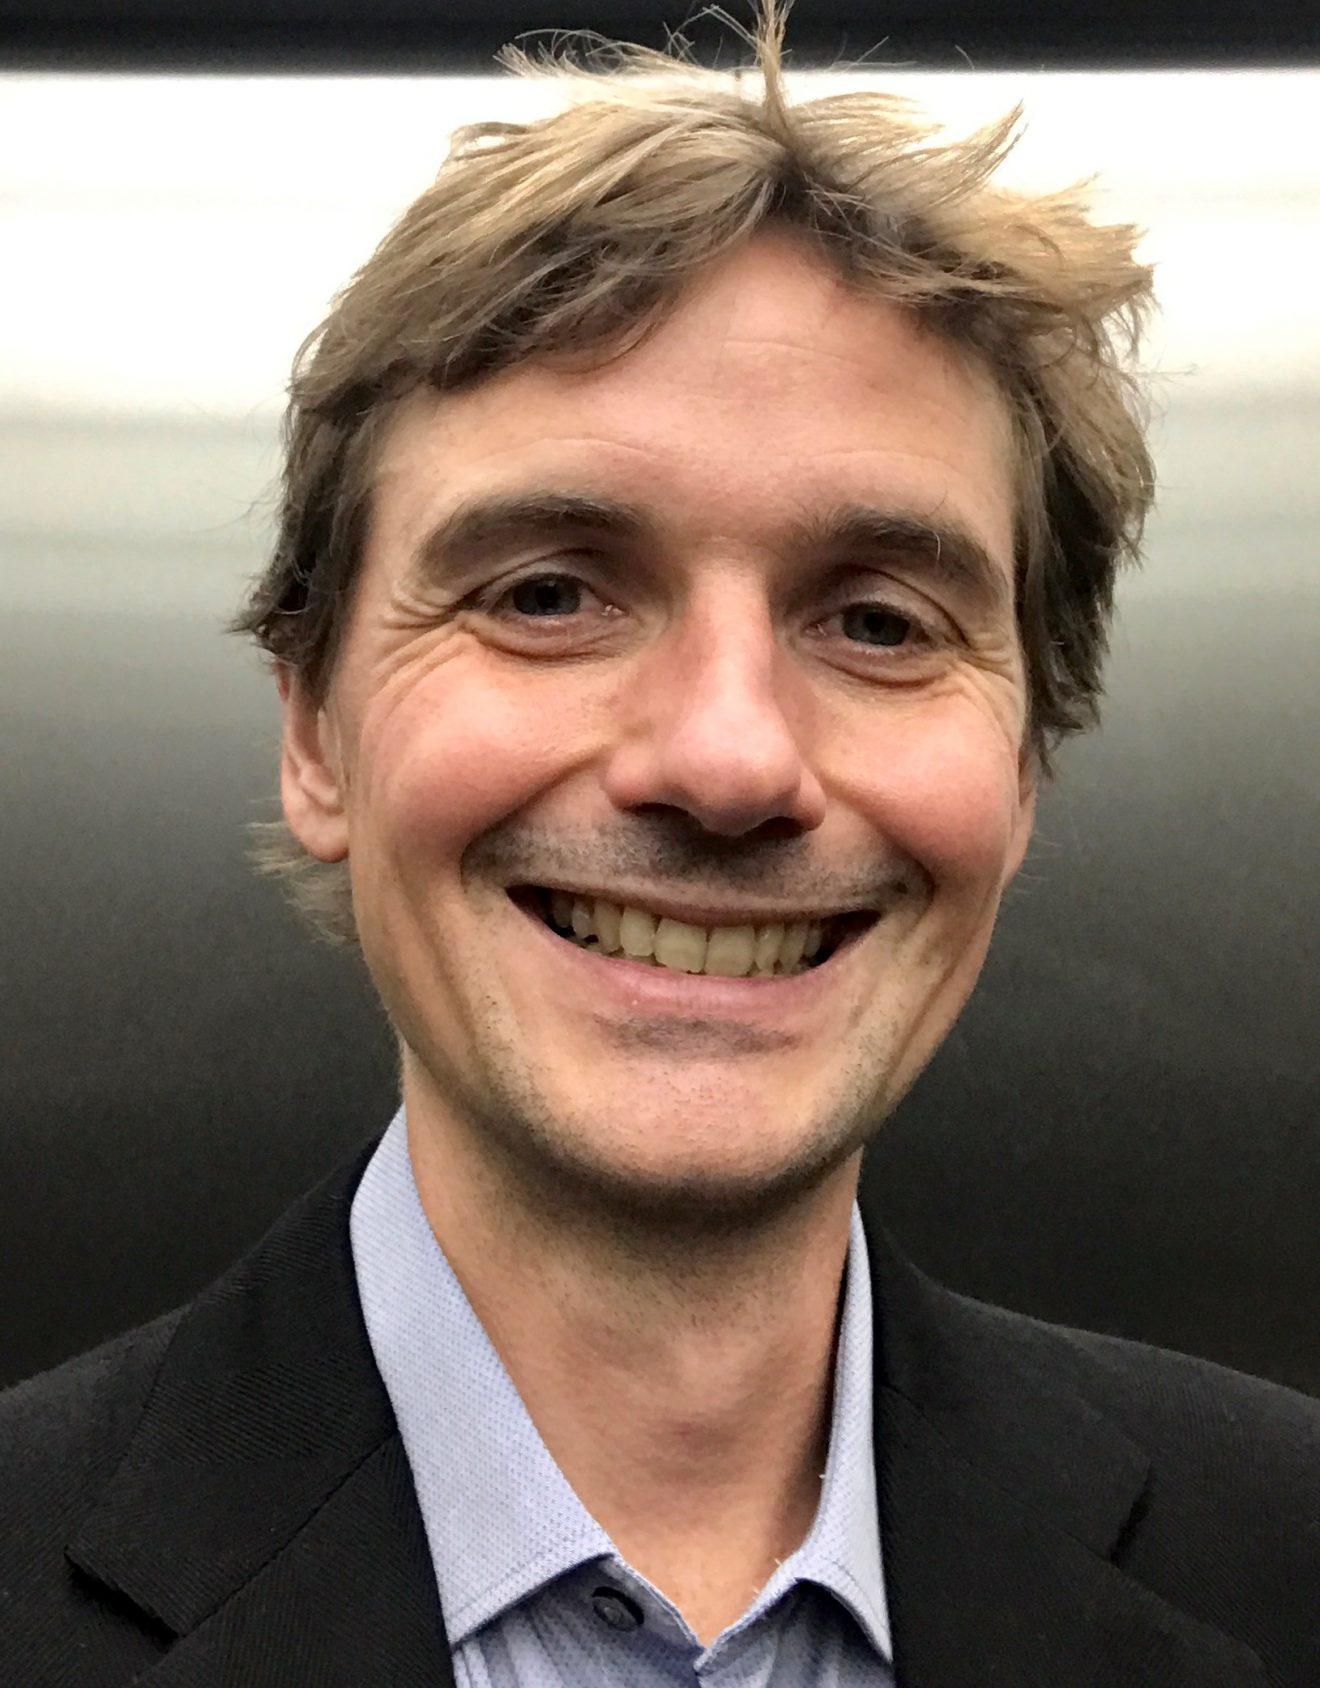 Prof. Dr. Stephane Bordas